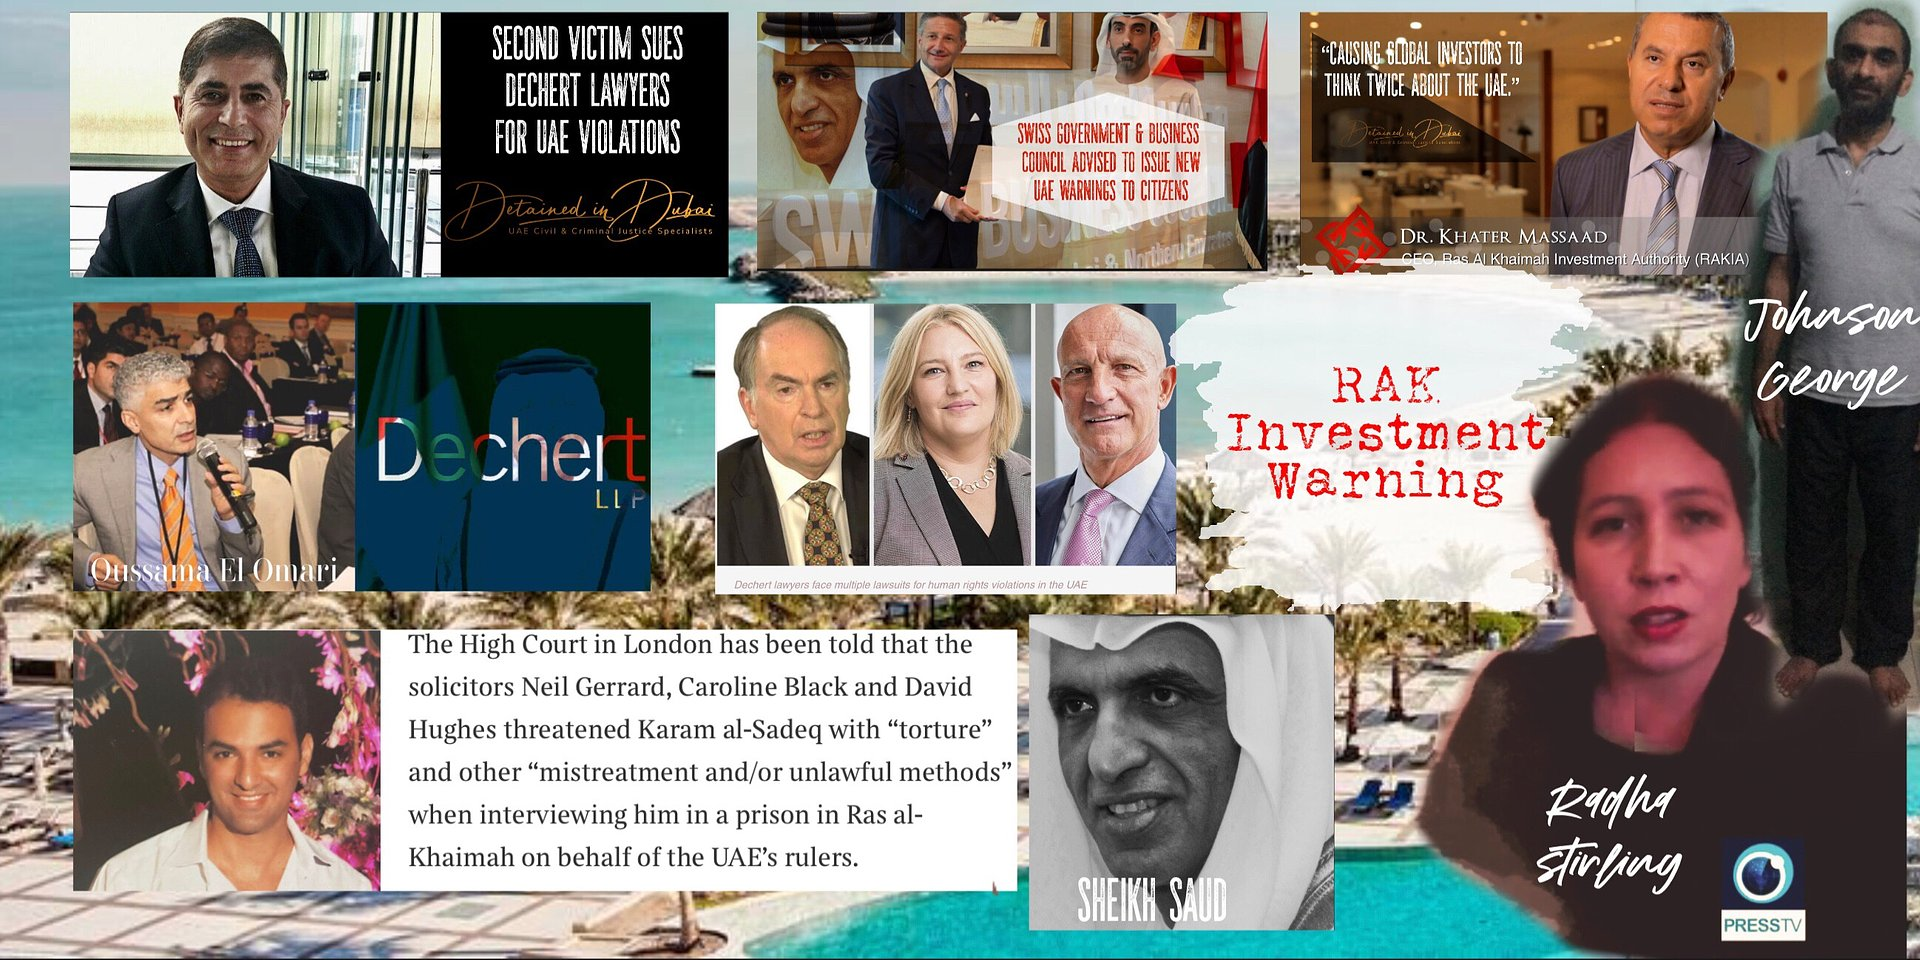 Dechert scandal leads to worldwide UAE investment warning